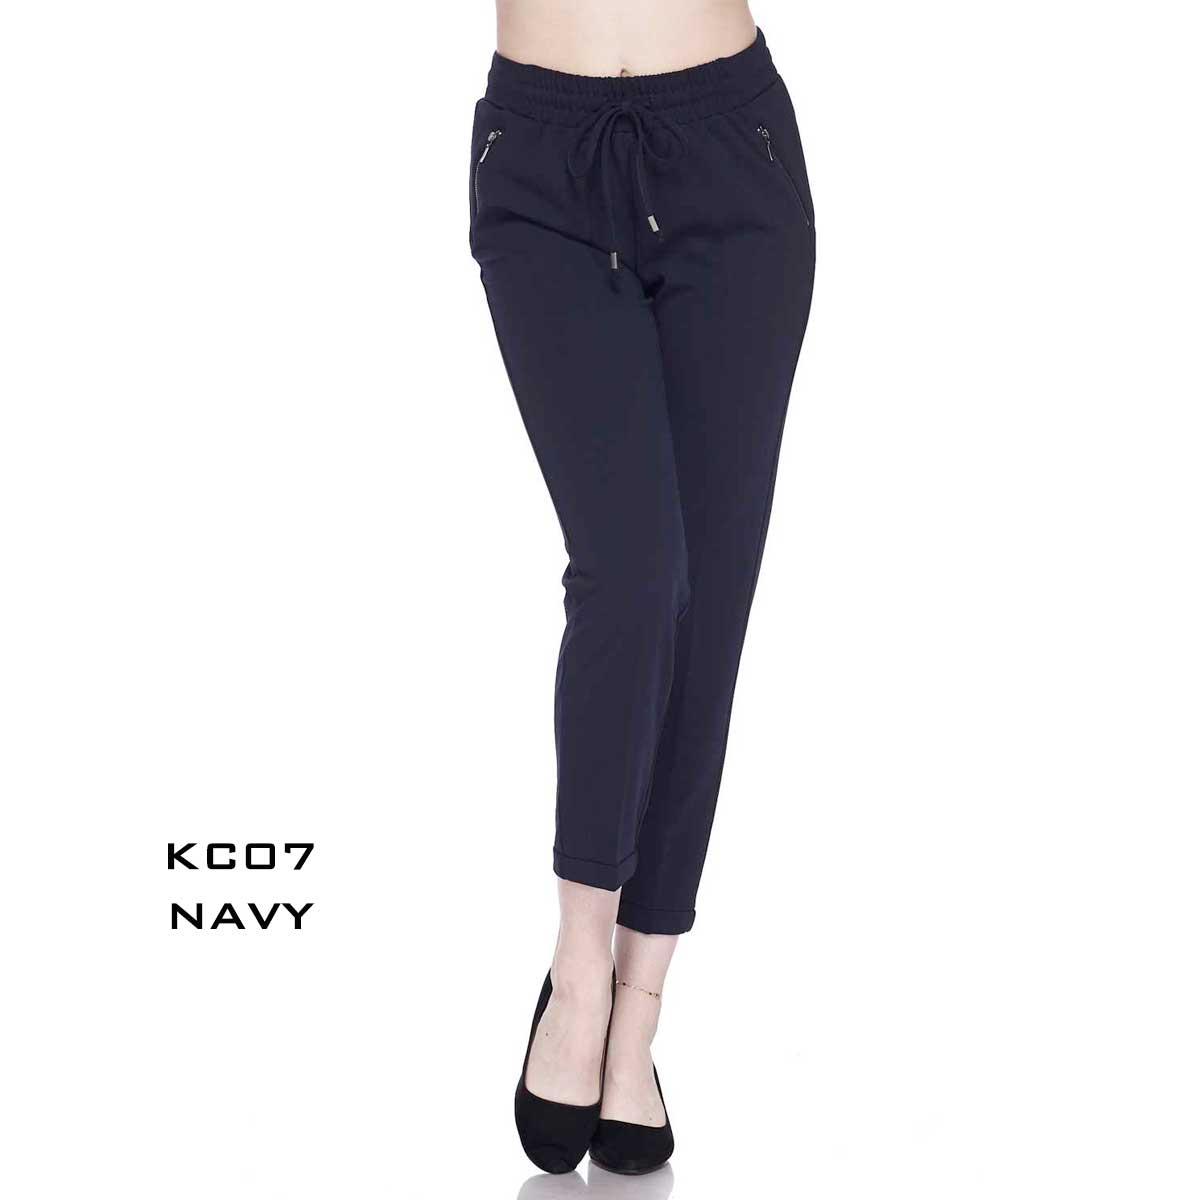 Pants - Drawstring Knit Crepe KC07